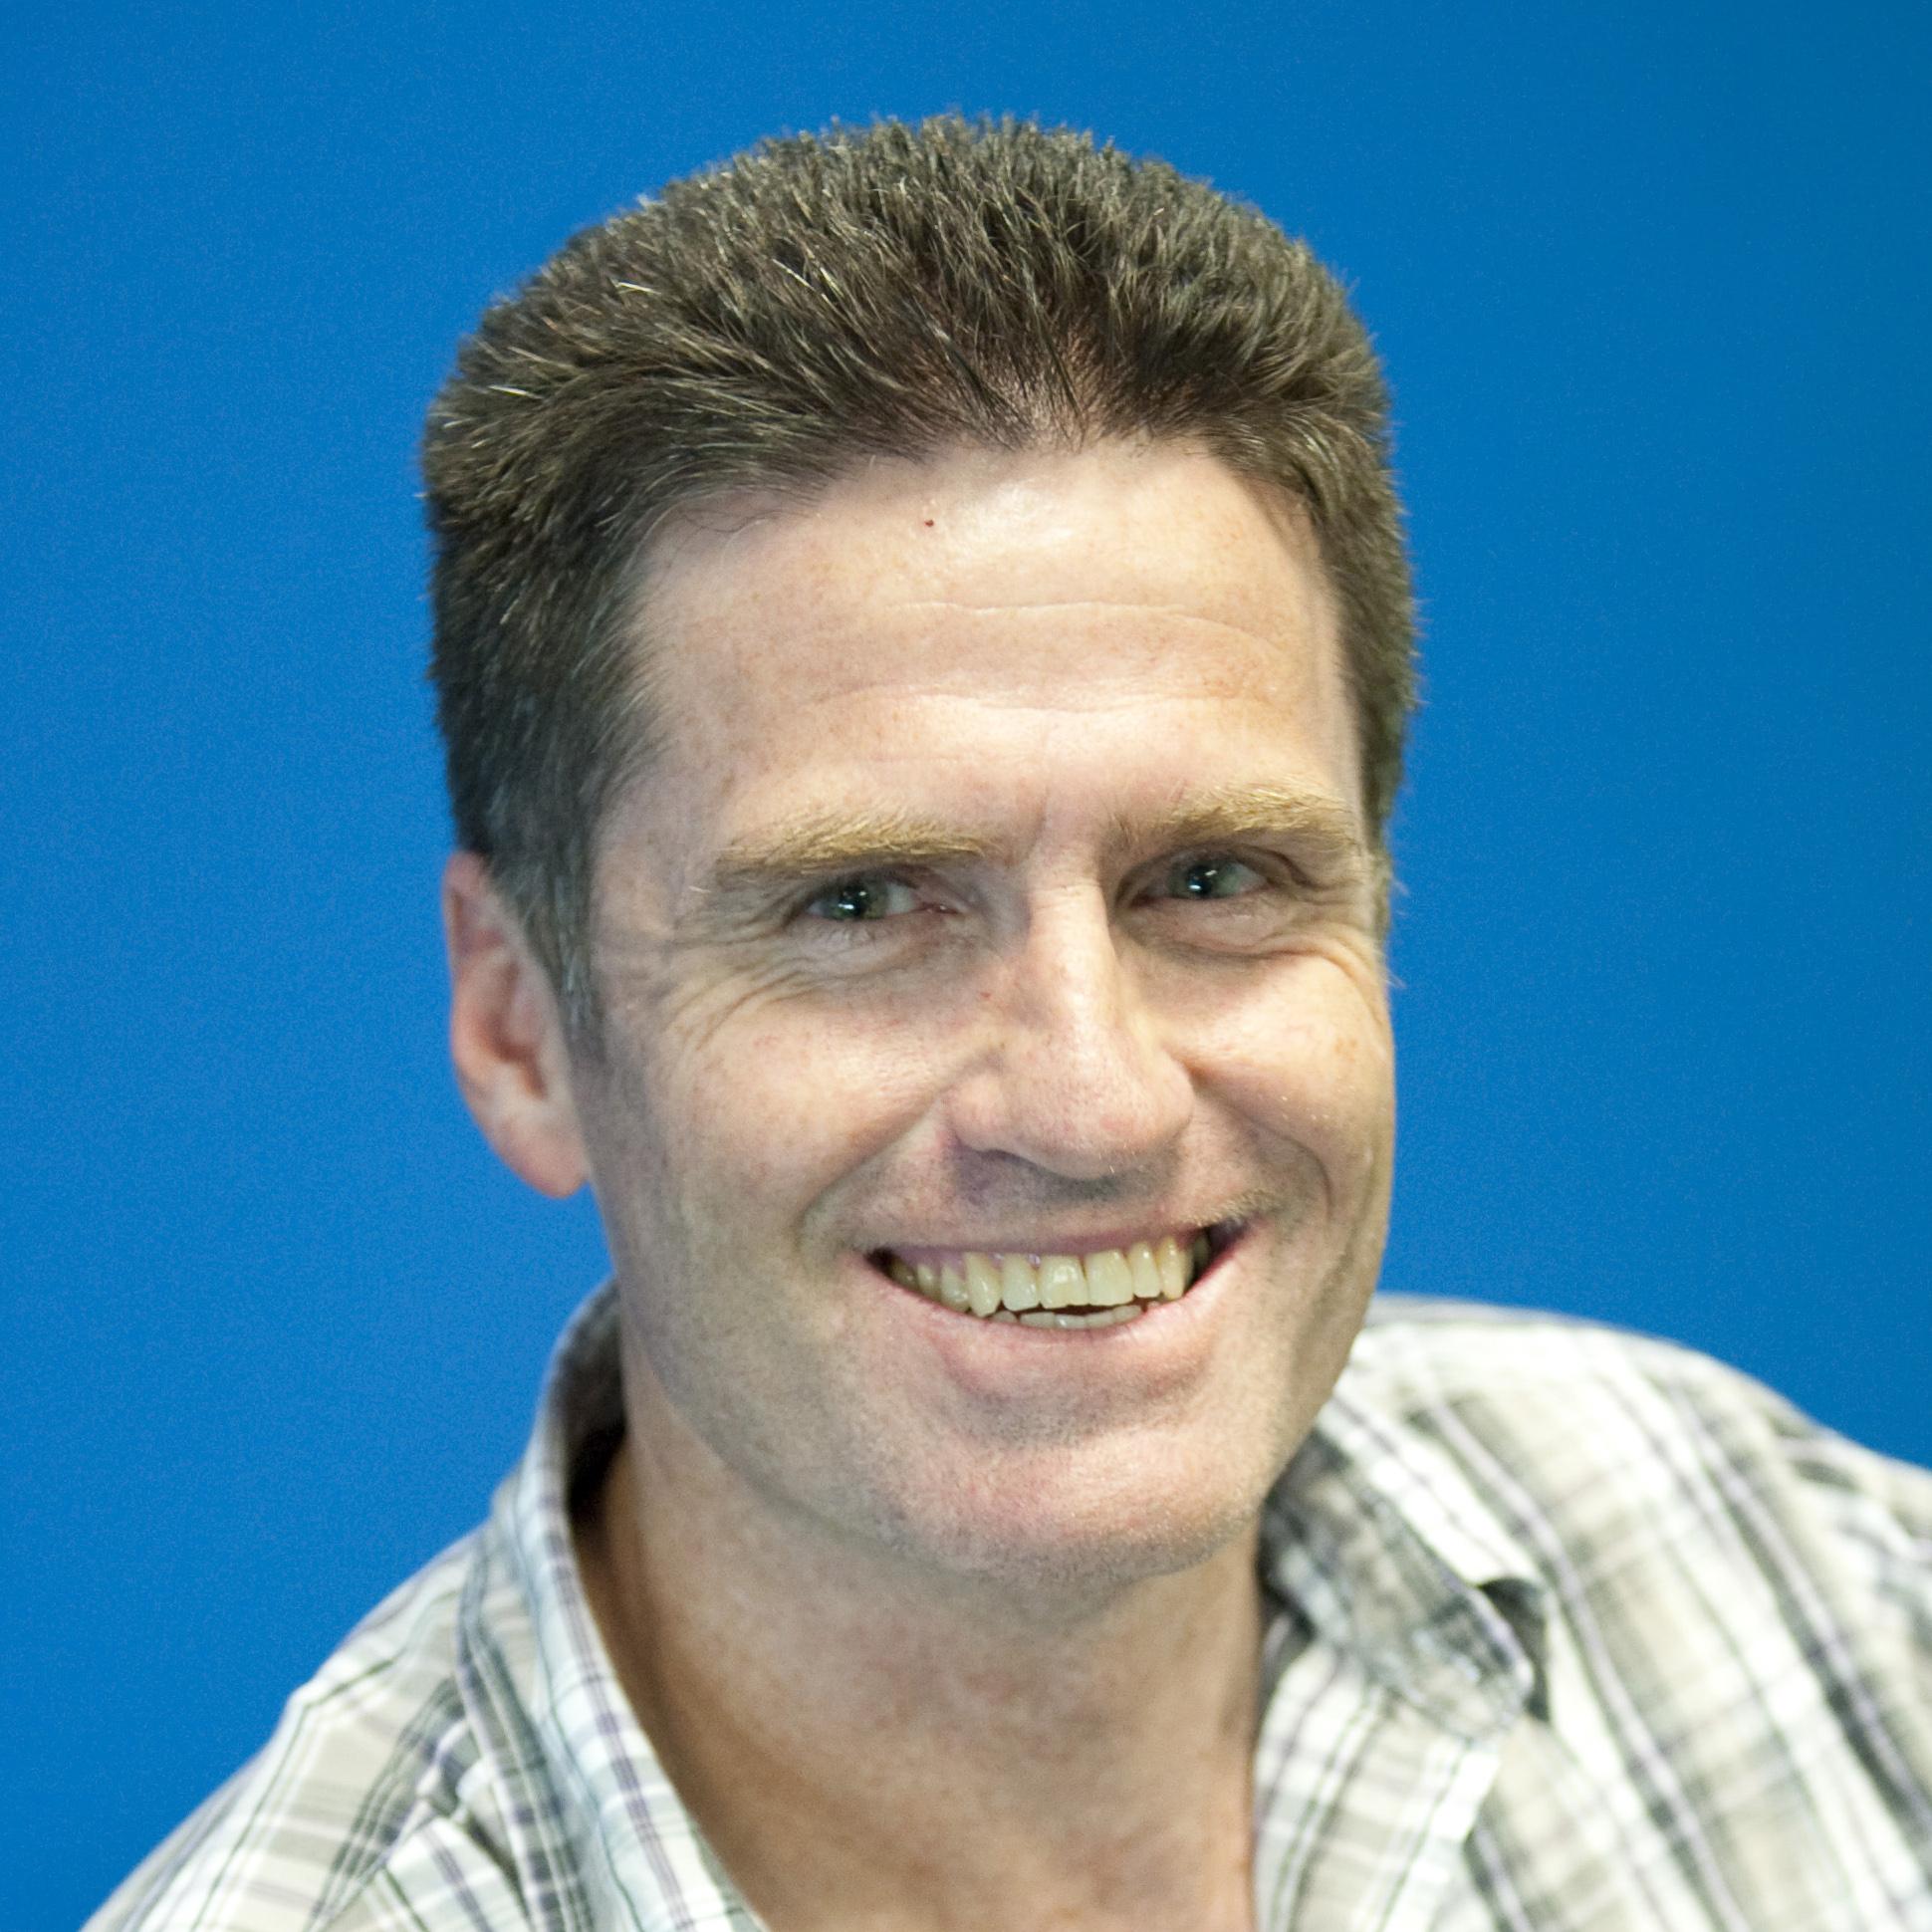 David Booth